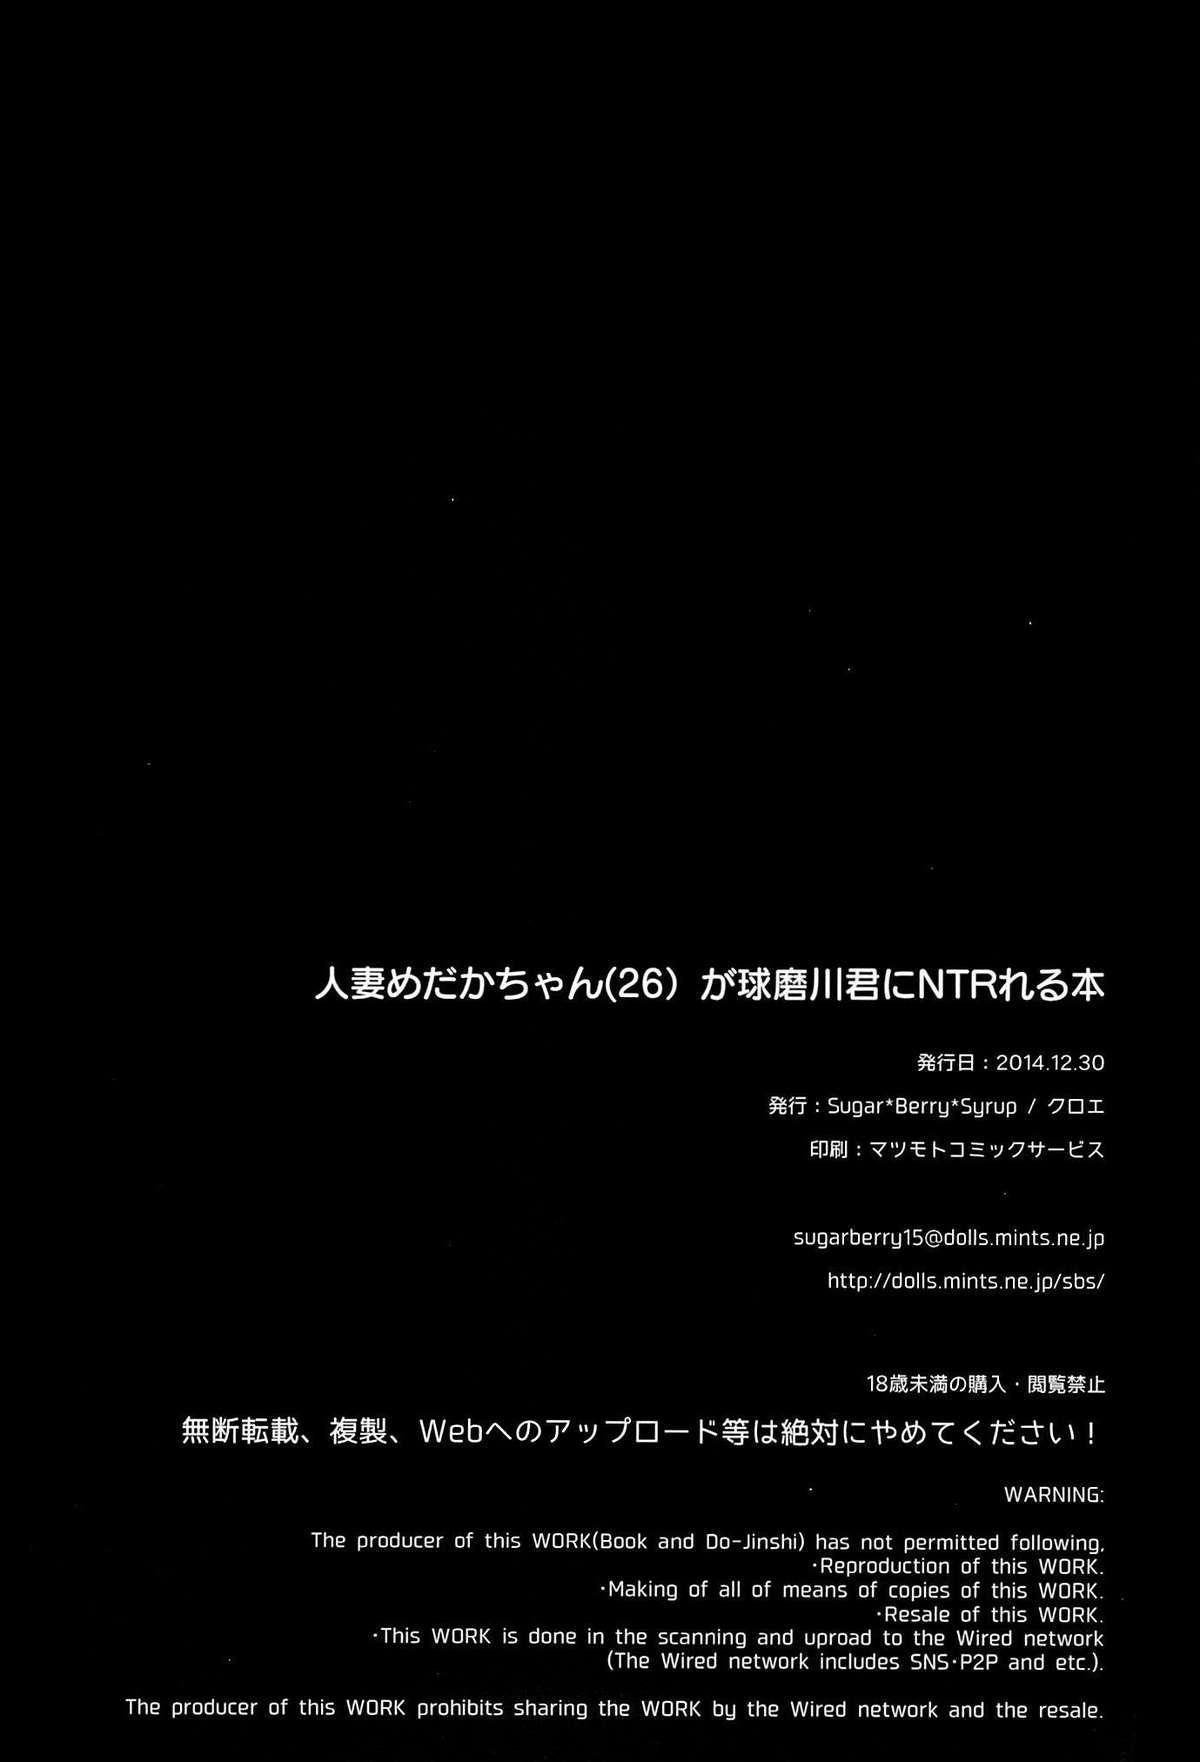 (C87) [Sugar*Berry*Syrup (Kuroe)] Hitozuma Medaka-chan (26) ga Kumagawa-kun ni NTR-reru Hon (Medaka Box) [Chinese] [脸肿汉化组] 29